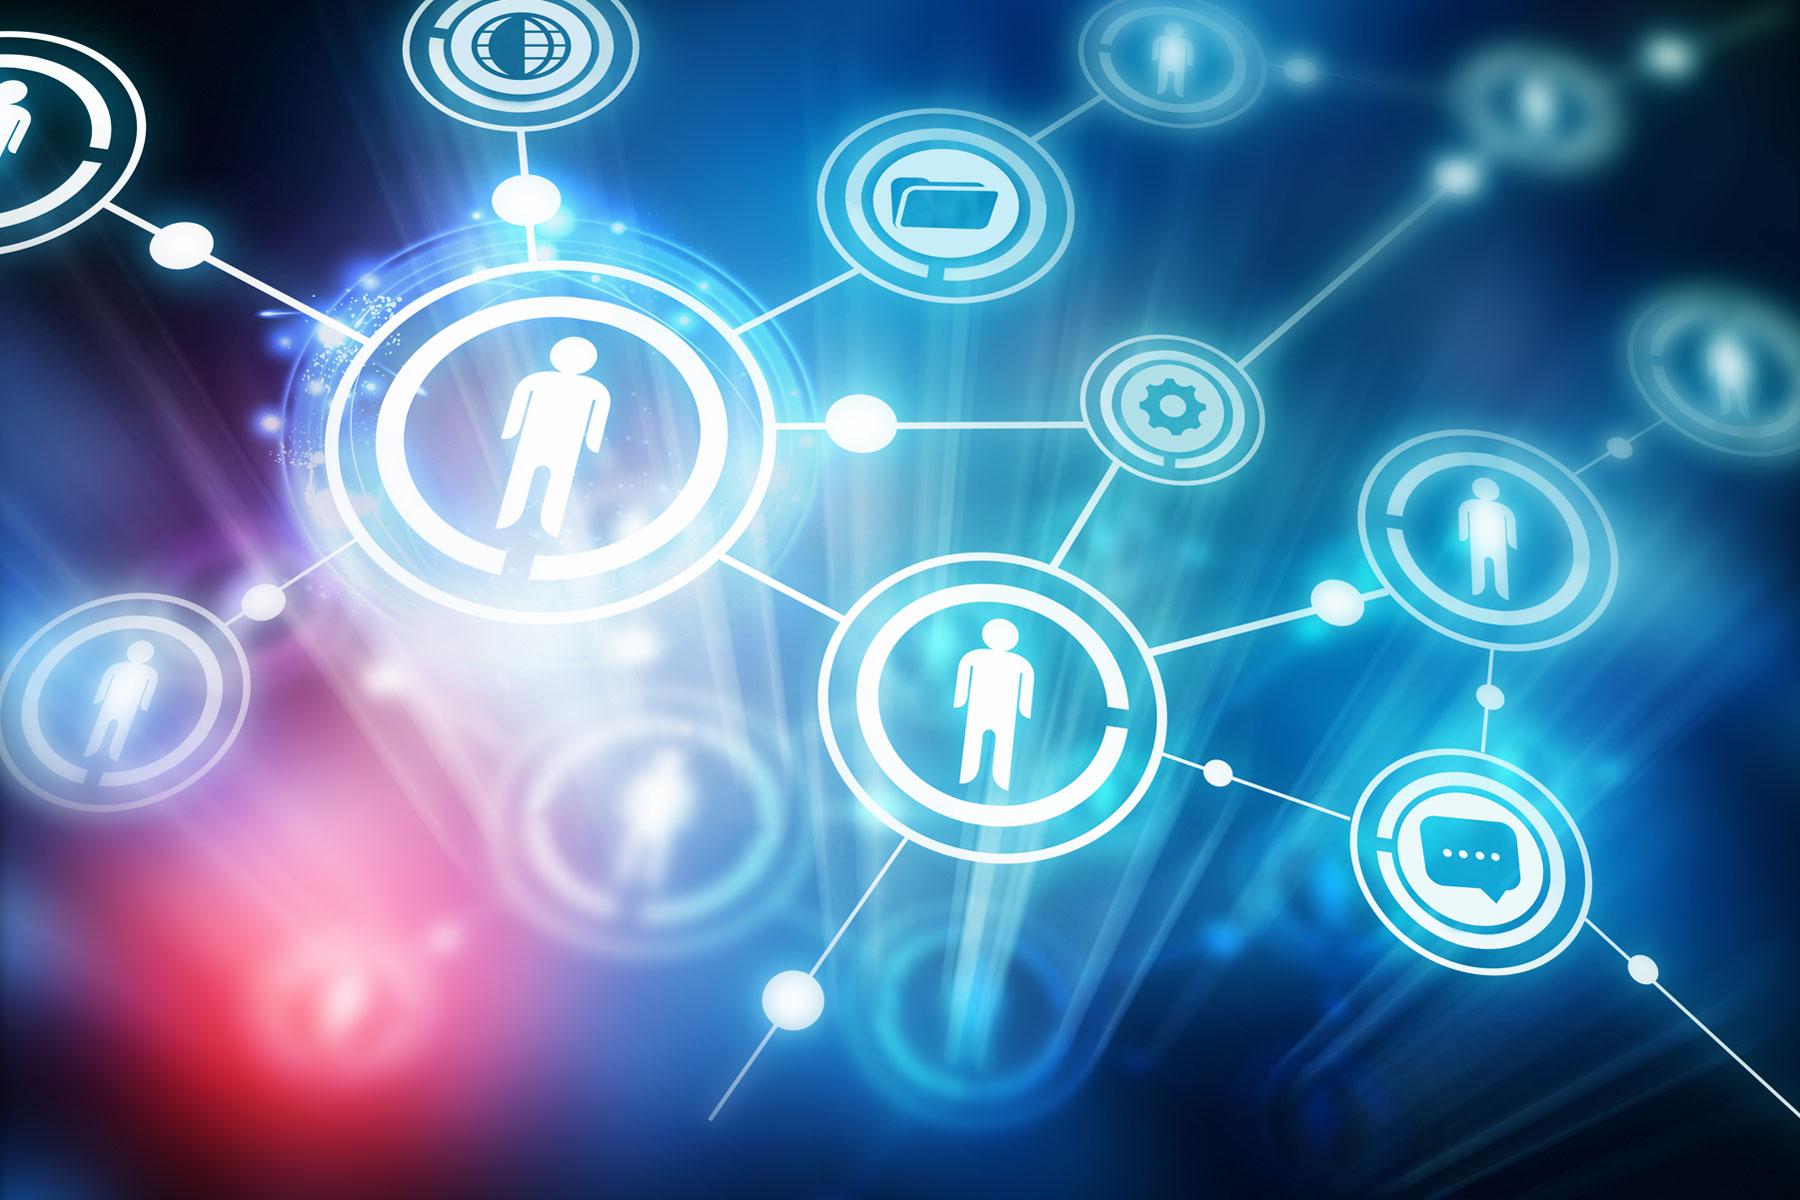 Stronger together: building scientific communities